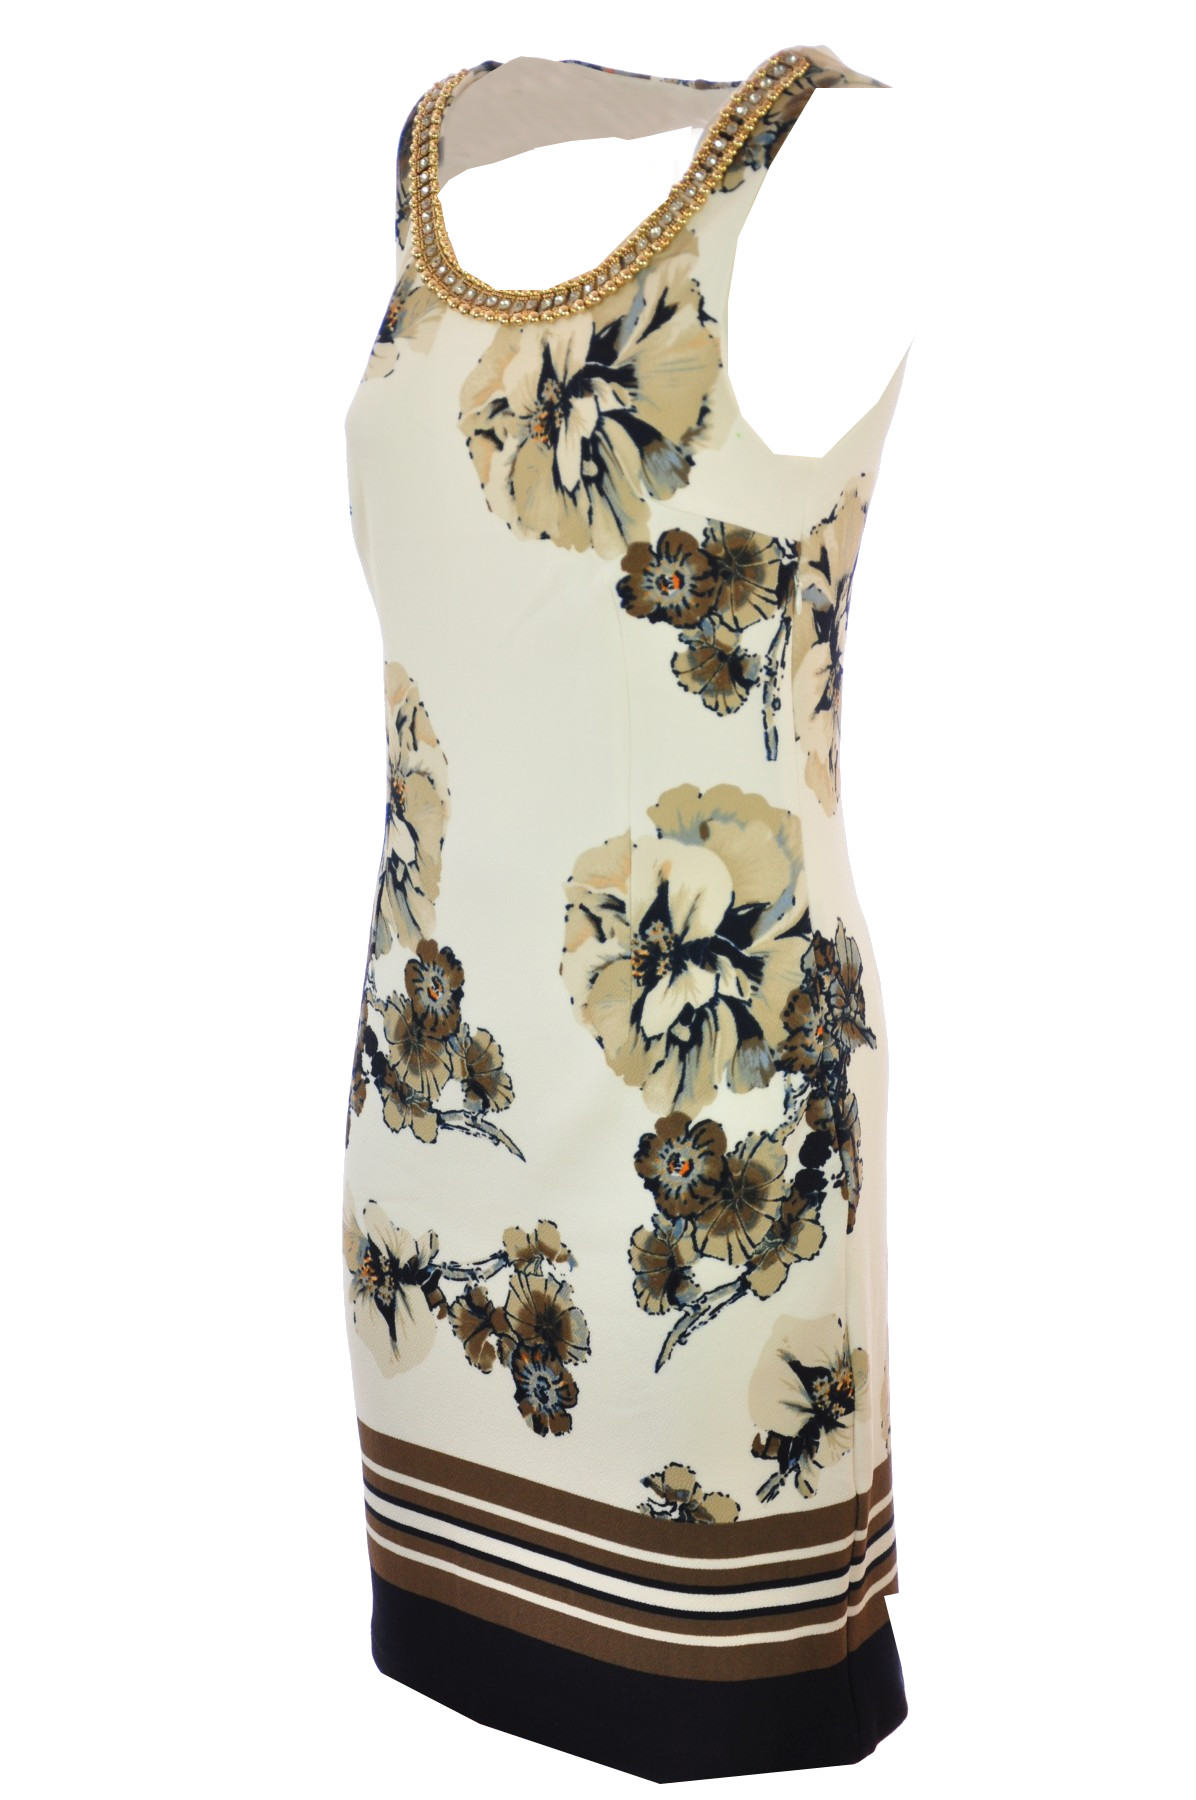 5a0ed4bf415c49 N408 jurk met speciale rug P690 K-design - Nathylicious Webshop